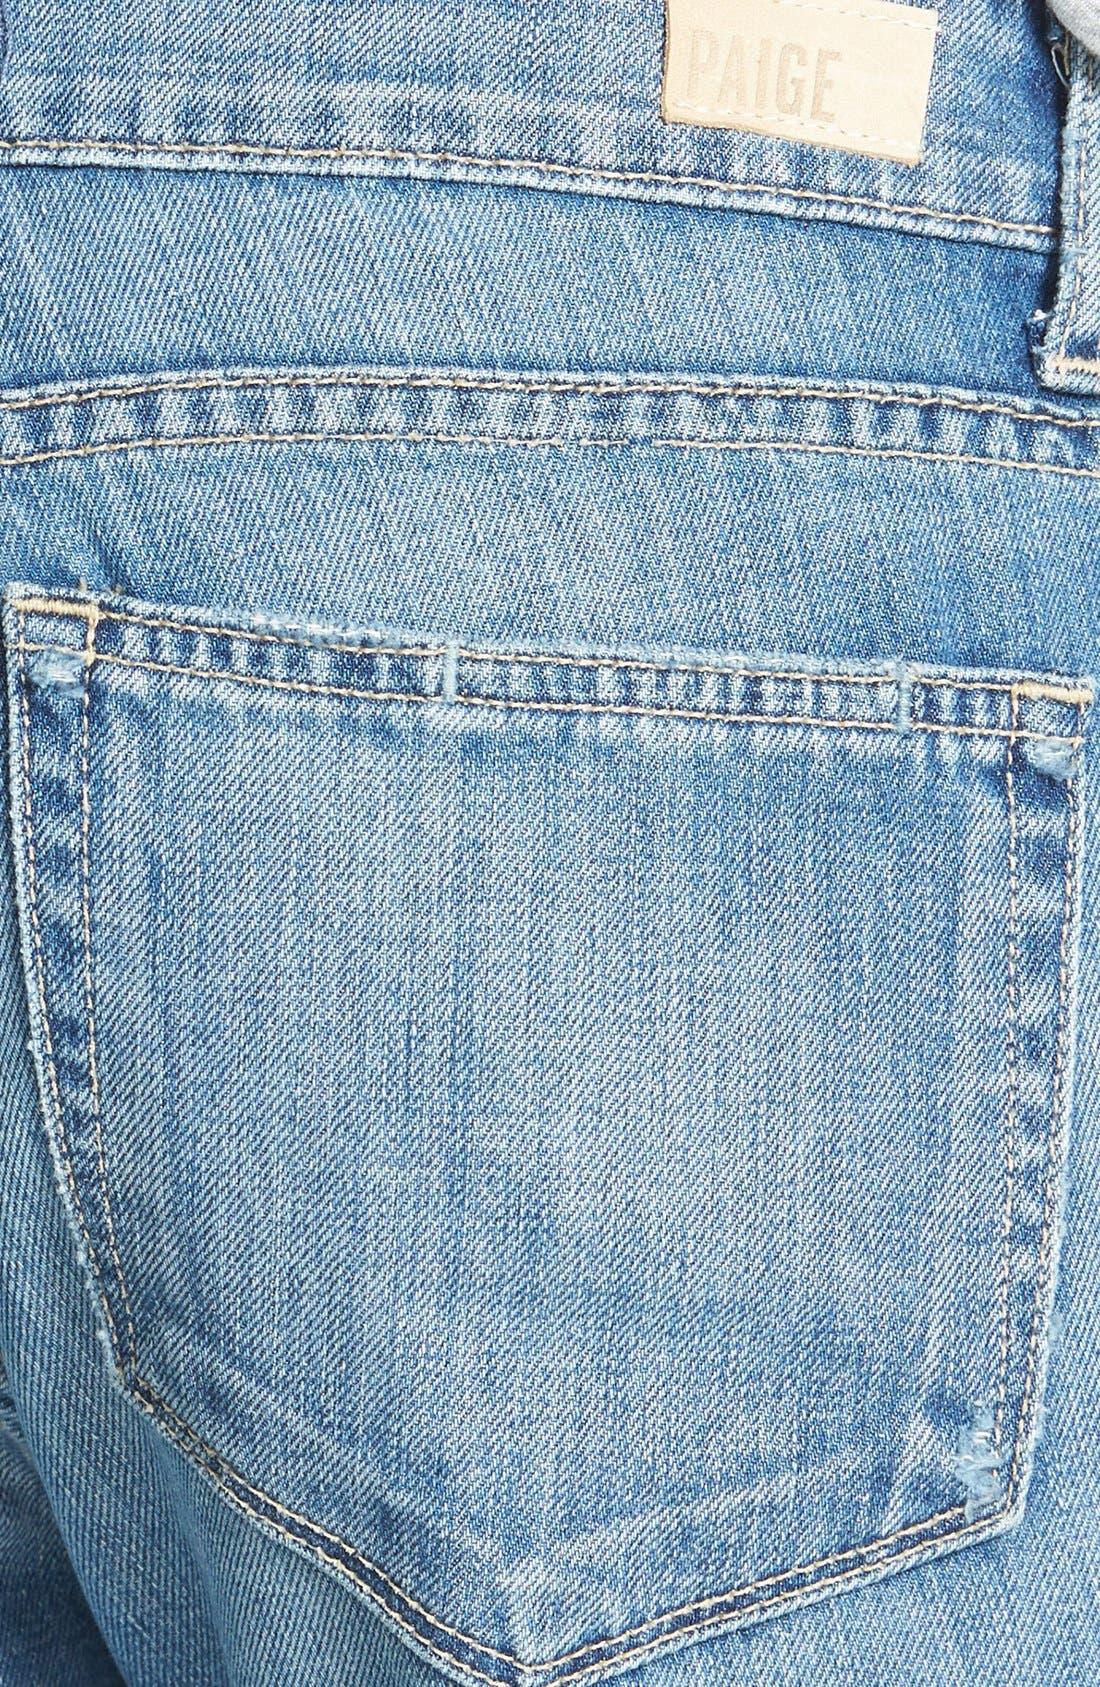 Alternate Image 3  - Paige Denim 'Jimmy Jimmy' Destroyed Boyfriend Jeans (Clifton)